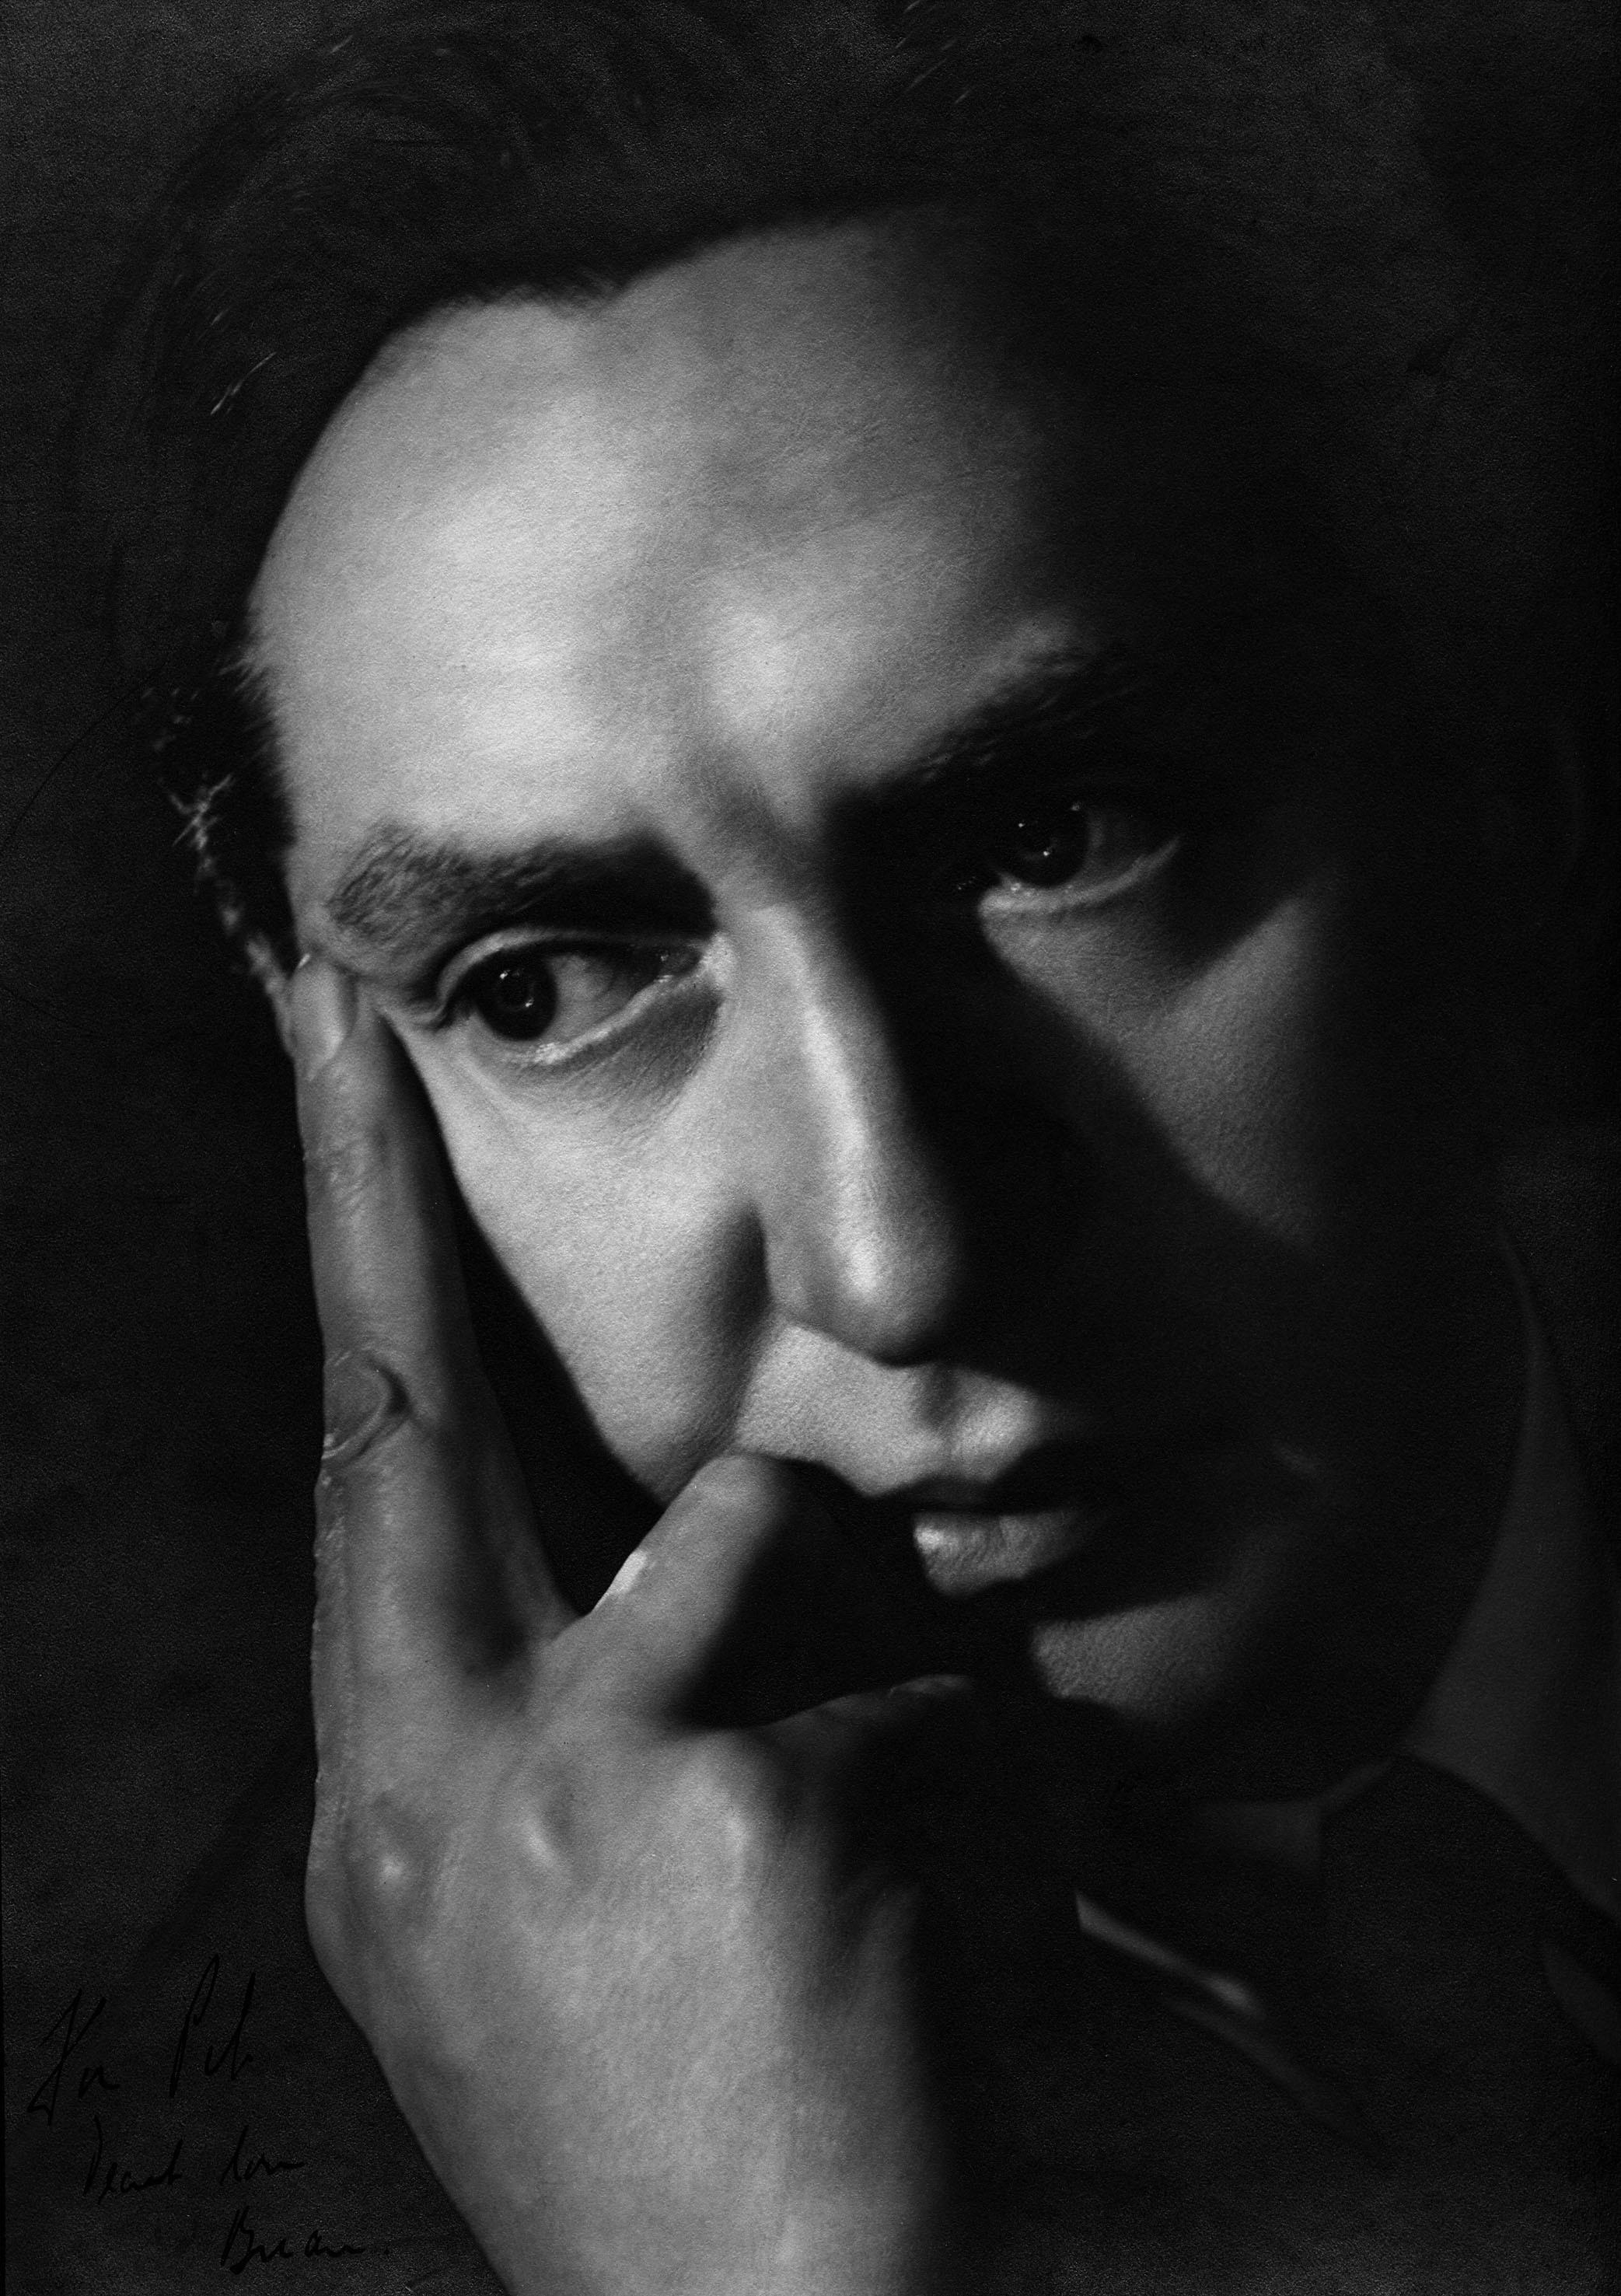 Hurst Photo Portrait. Angus McBean. Copyright Harvard University.